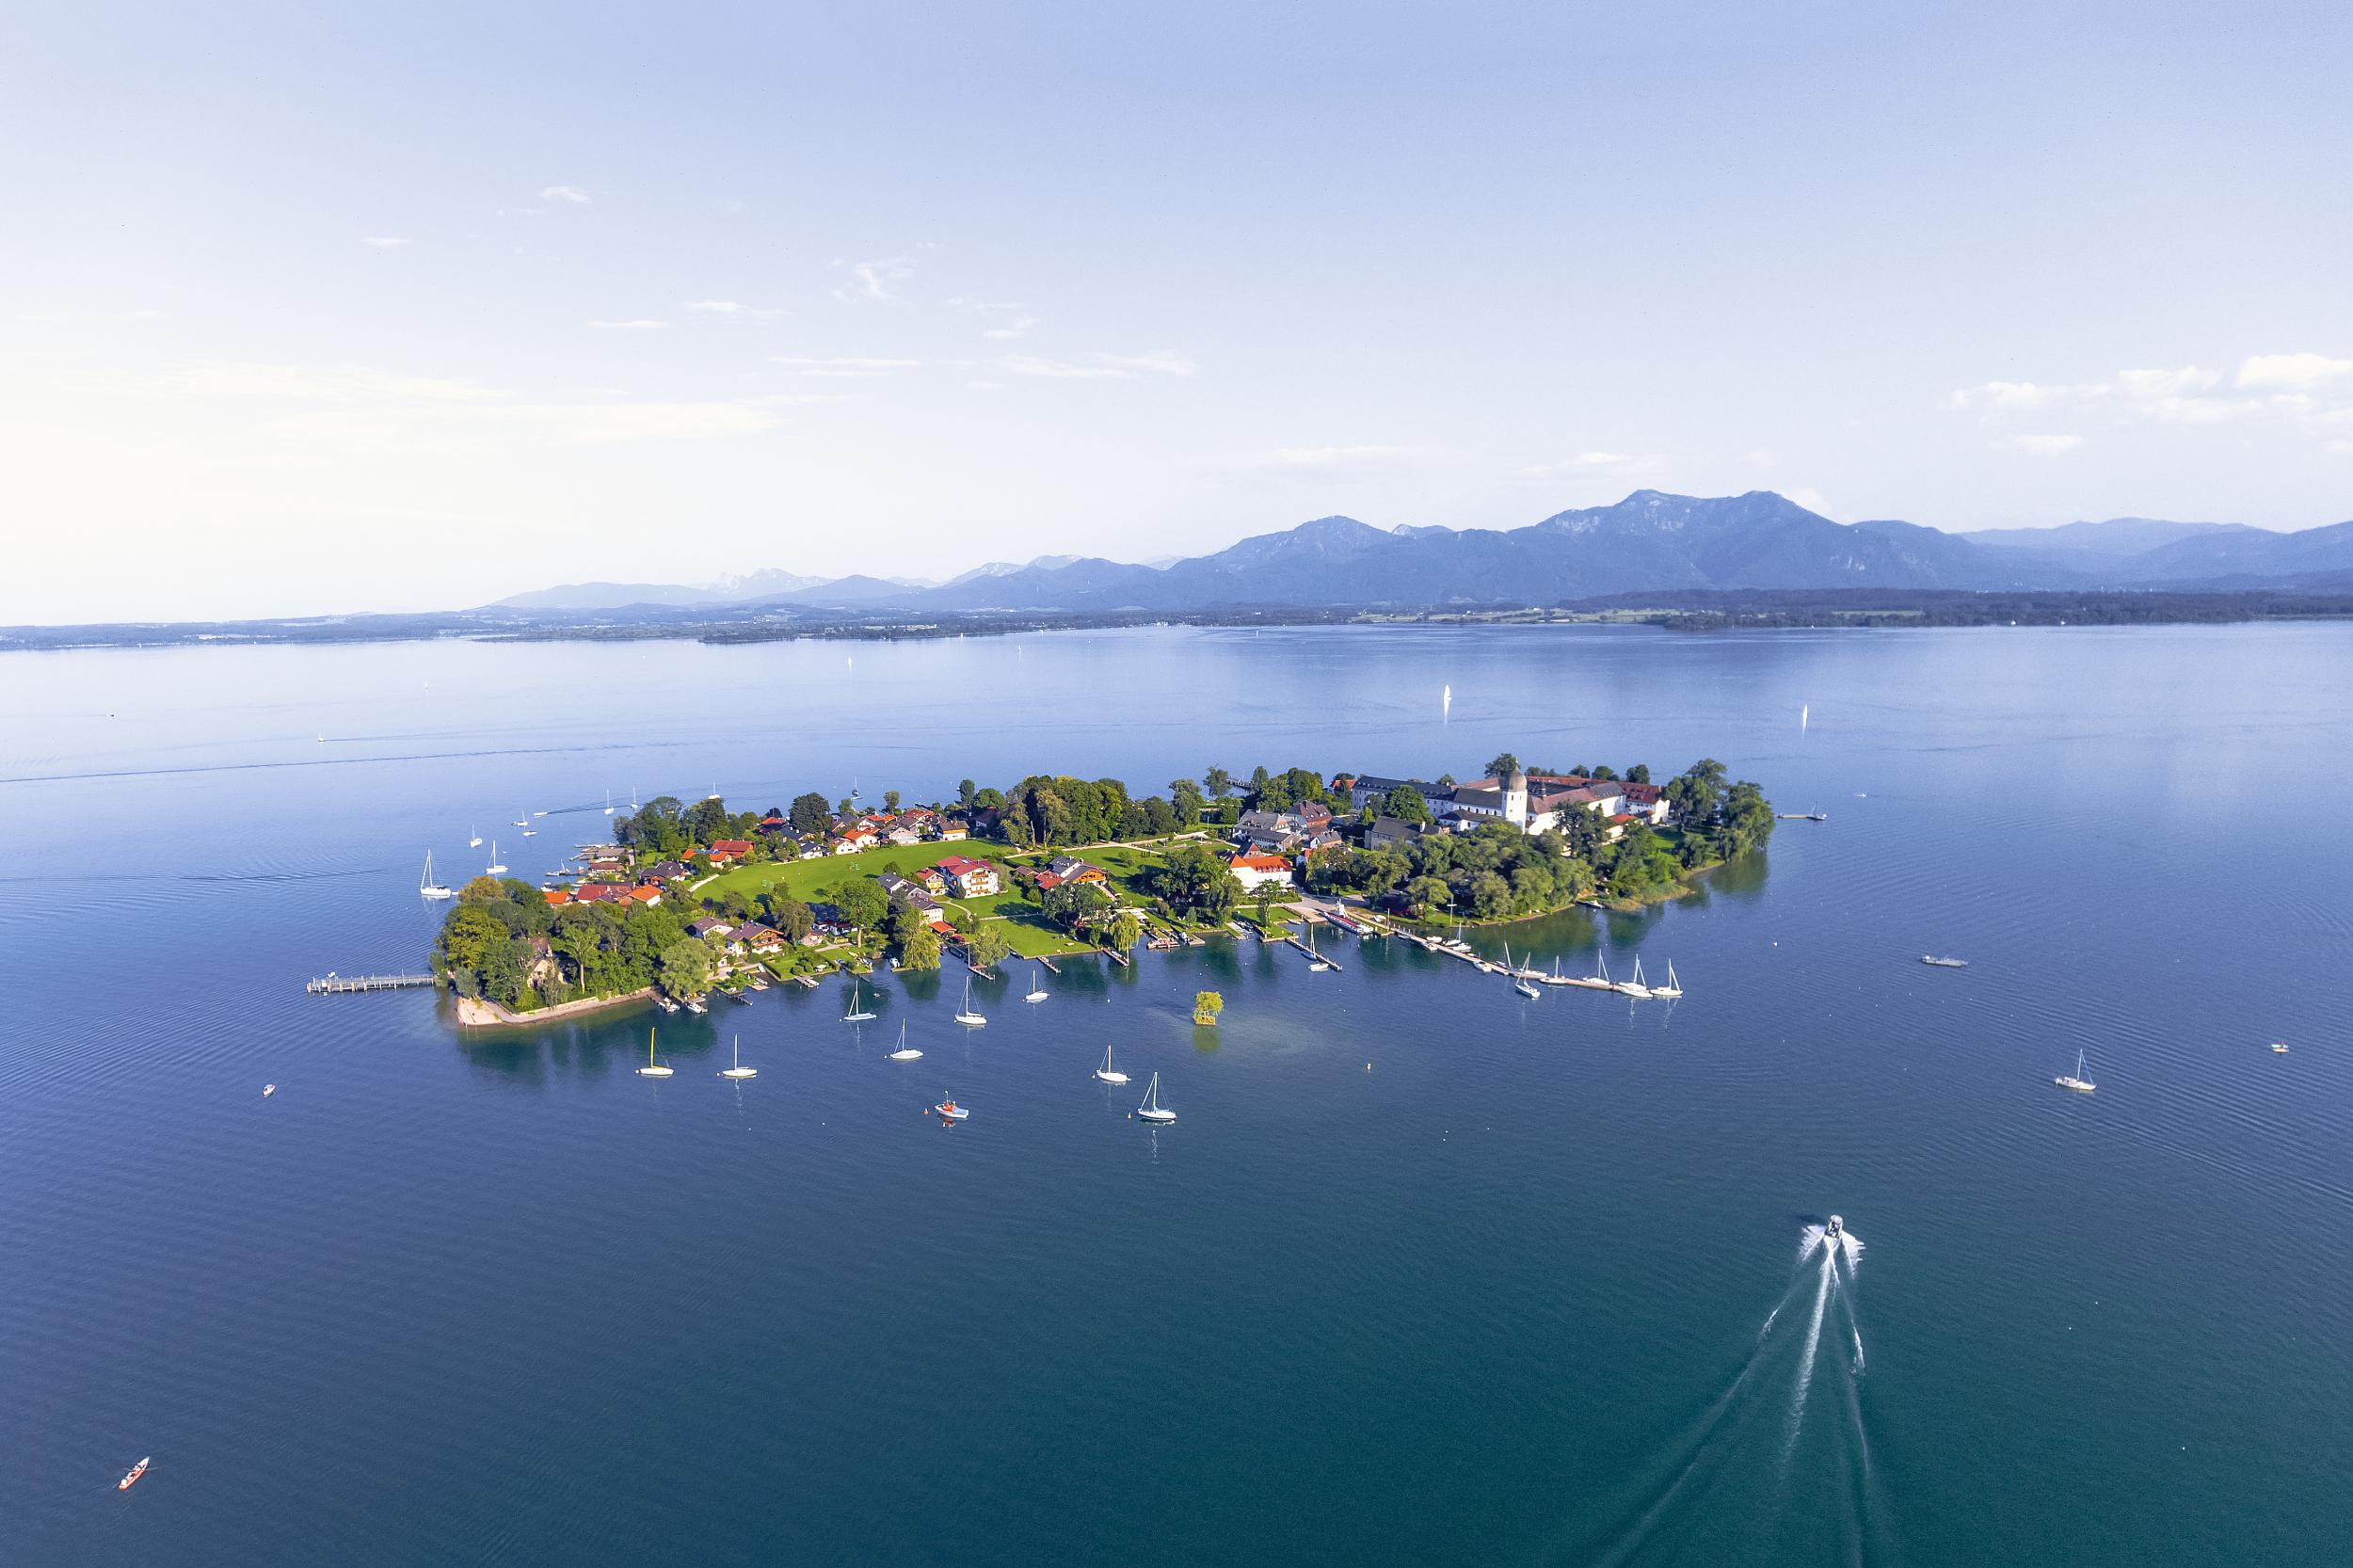 Magnetic Lake Scenic Area